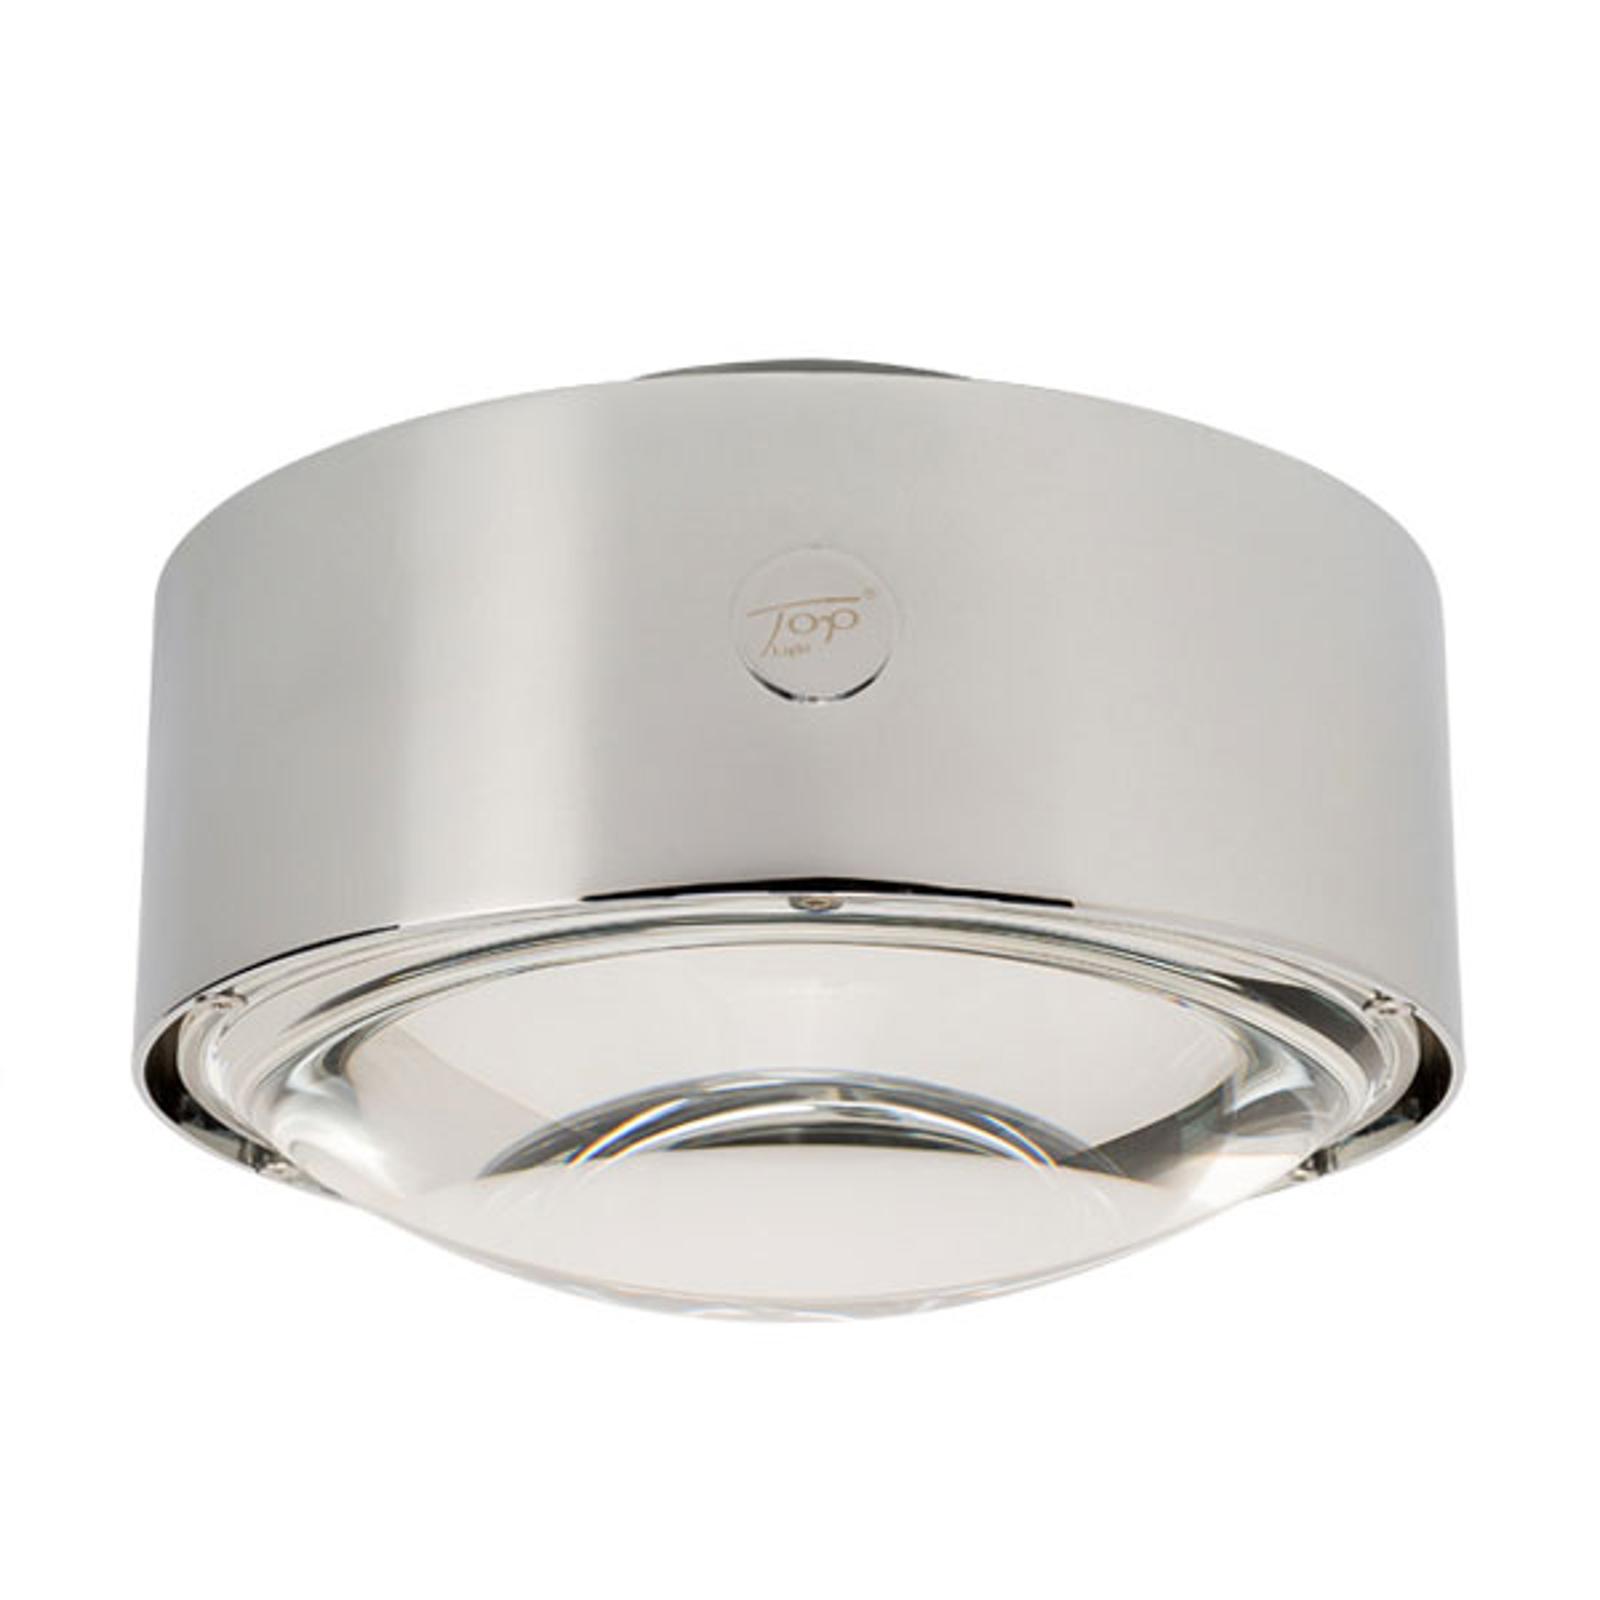 Lampa sufitowa LED Puk Meg Maxx Plus, chrom matowy